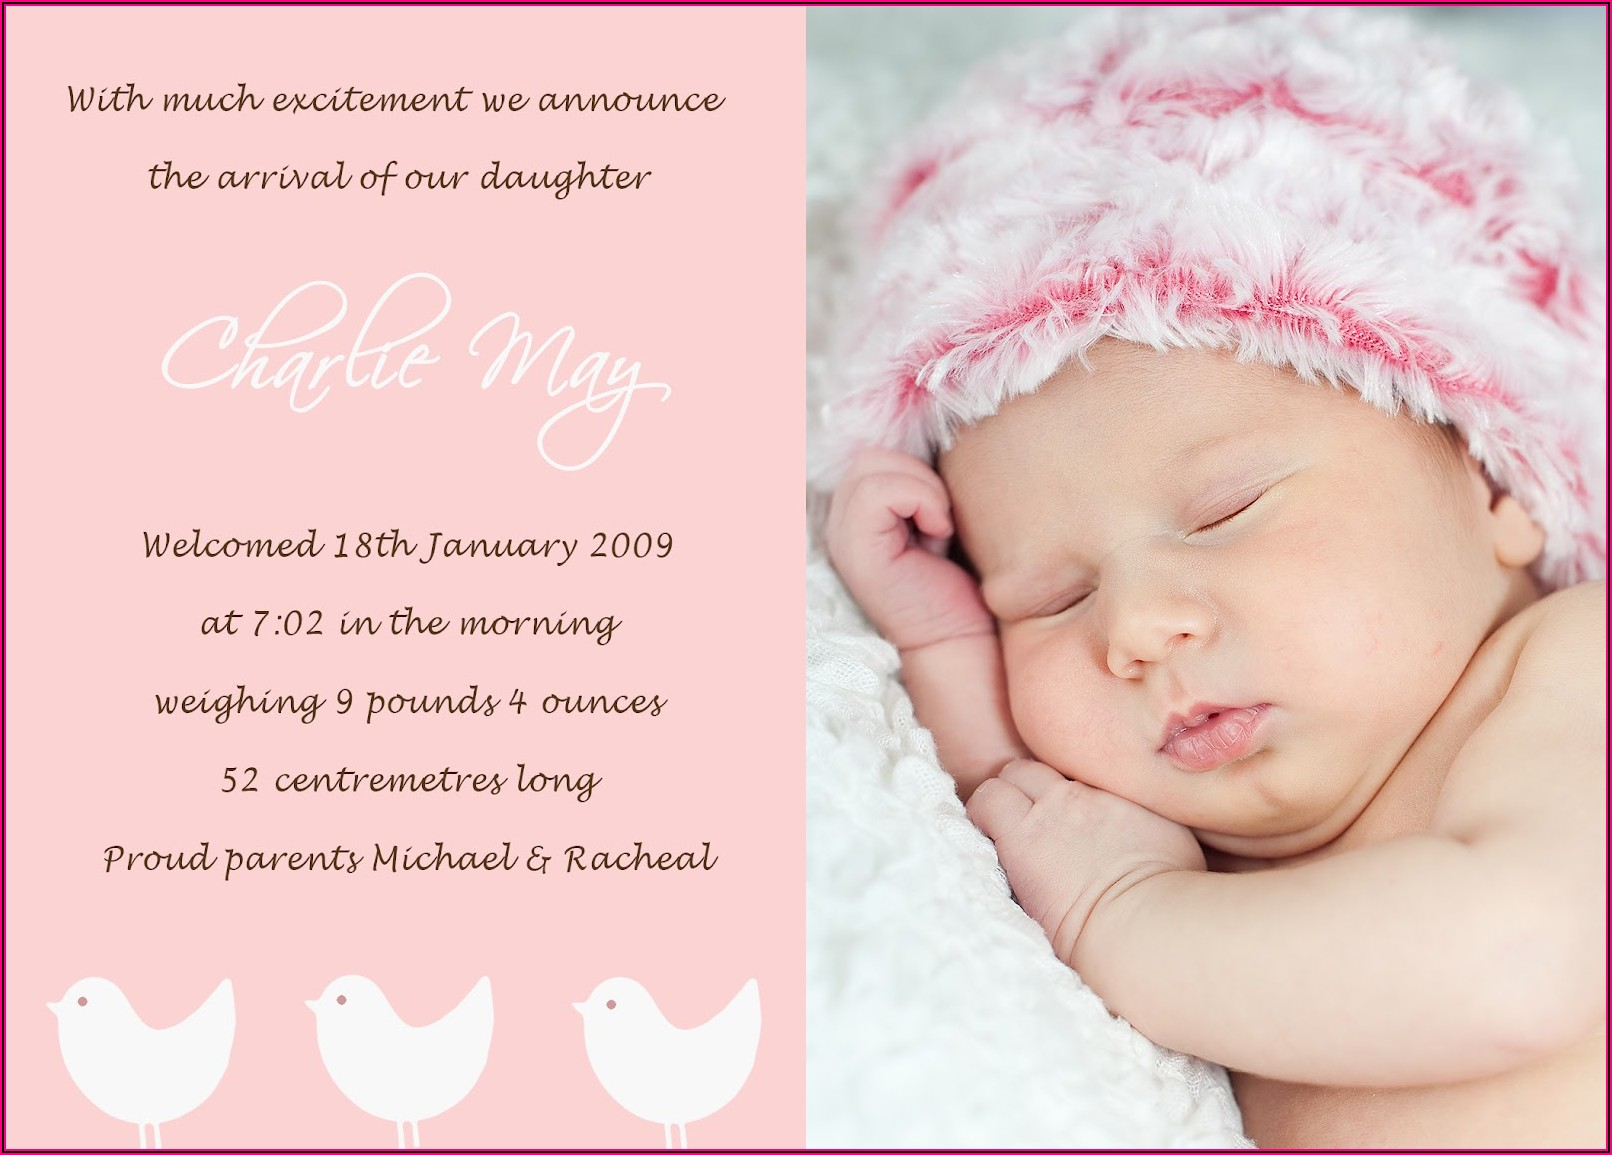 Second Child Birth Announcement Wording